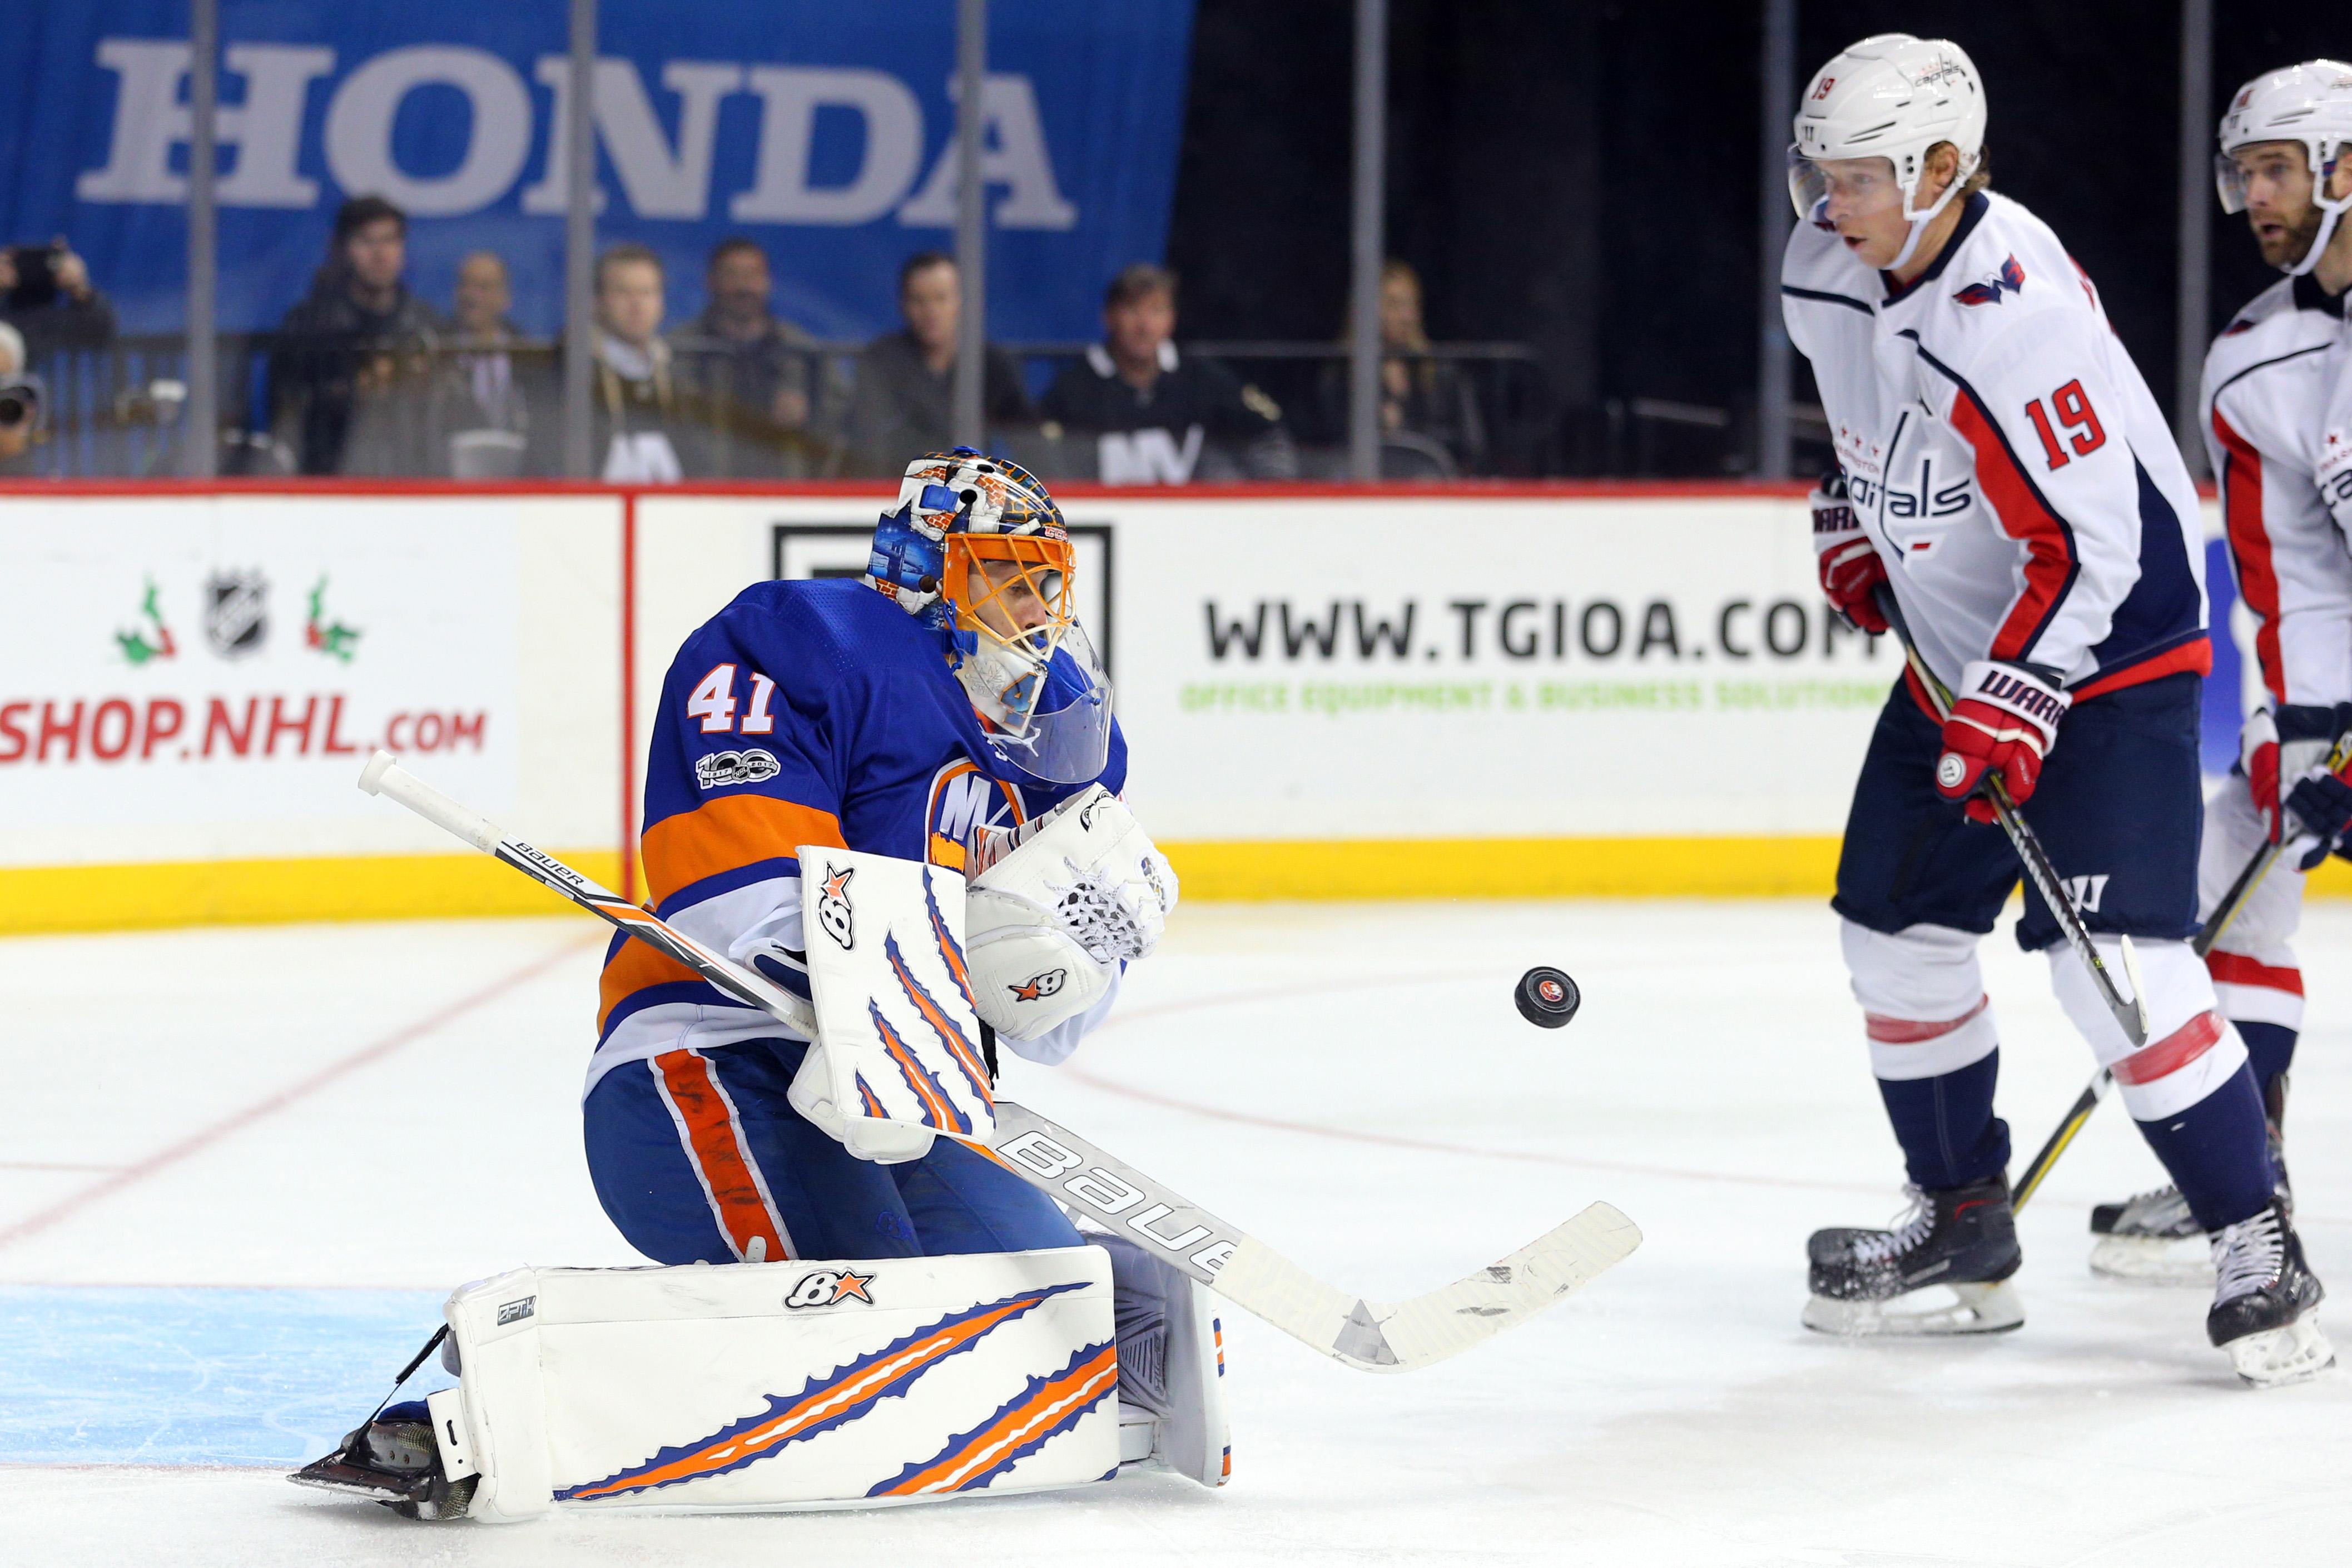 Halak Gives Islanders Much Needed Performance in Net